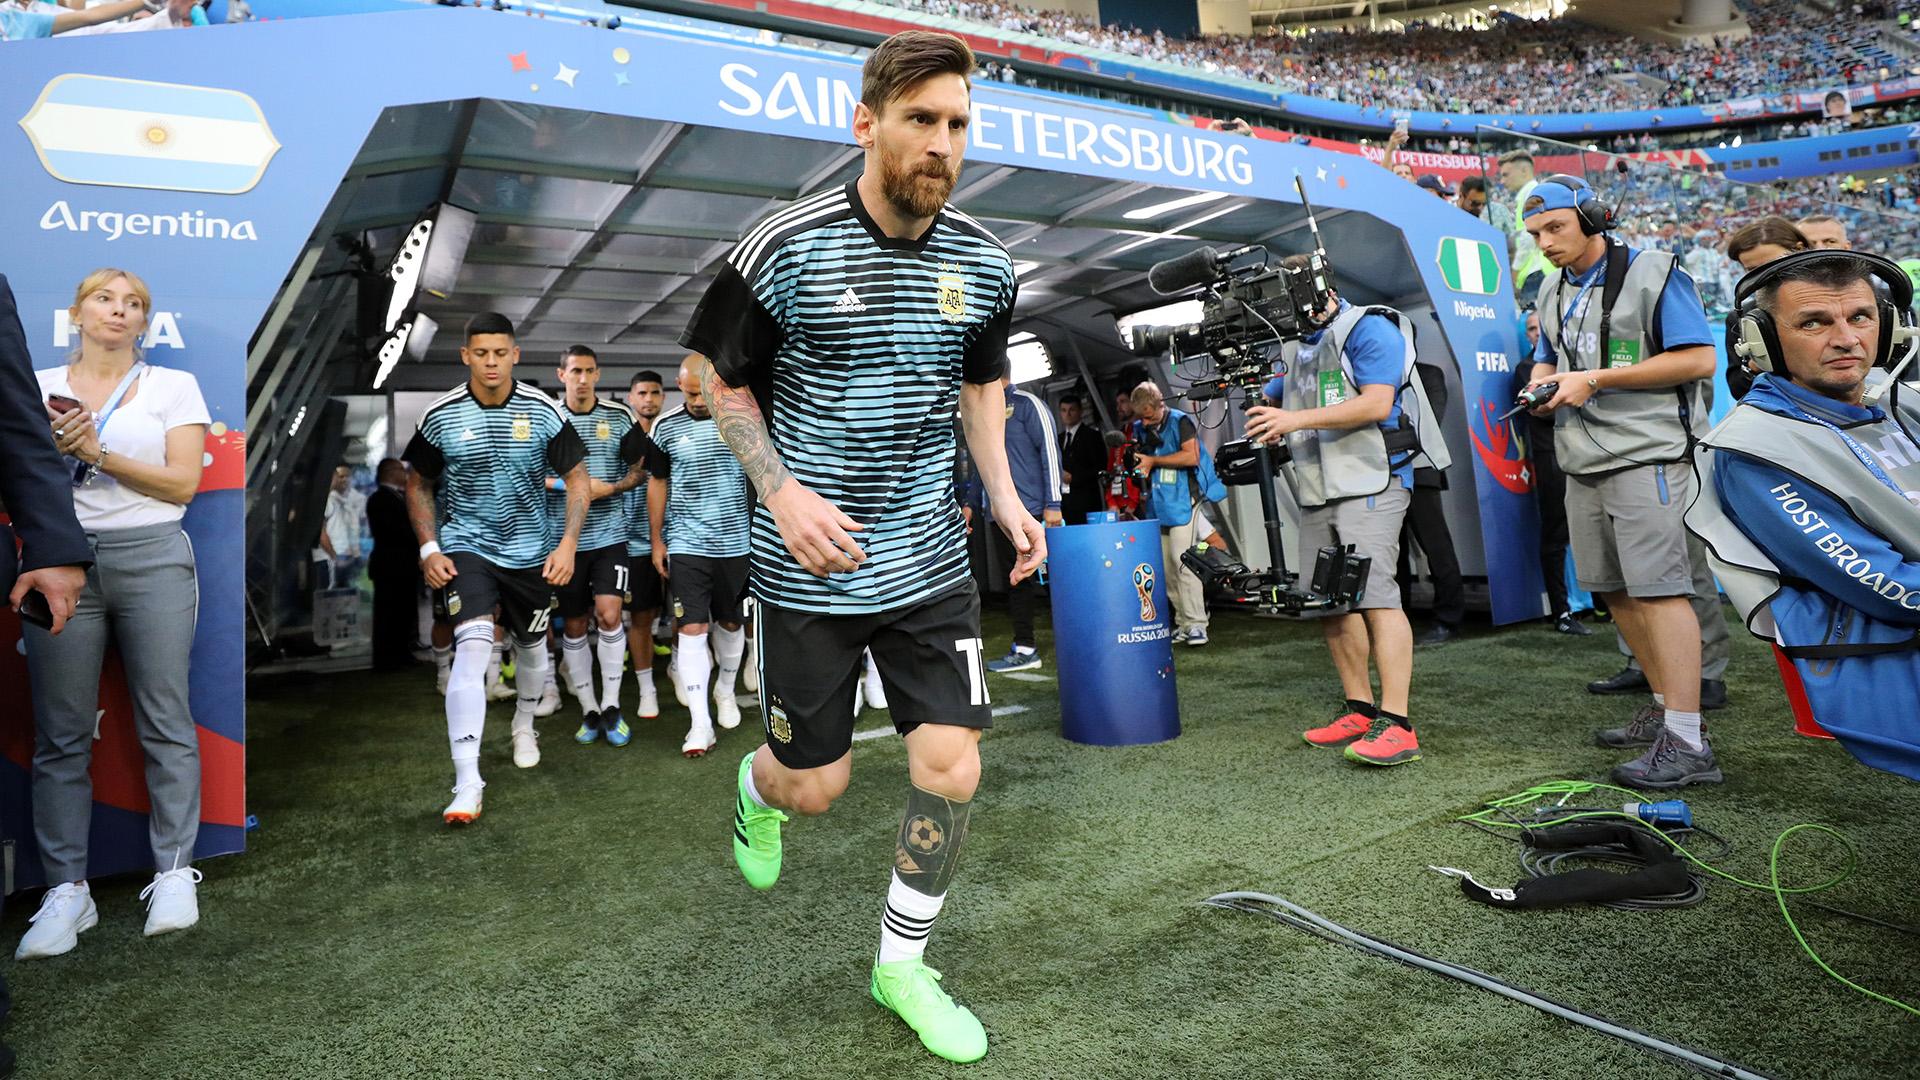 La salida del capitán argentino al campo